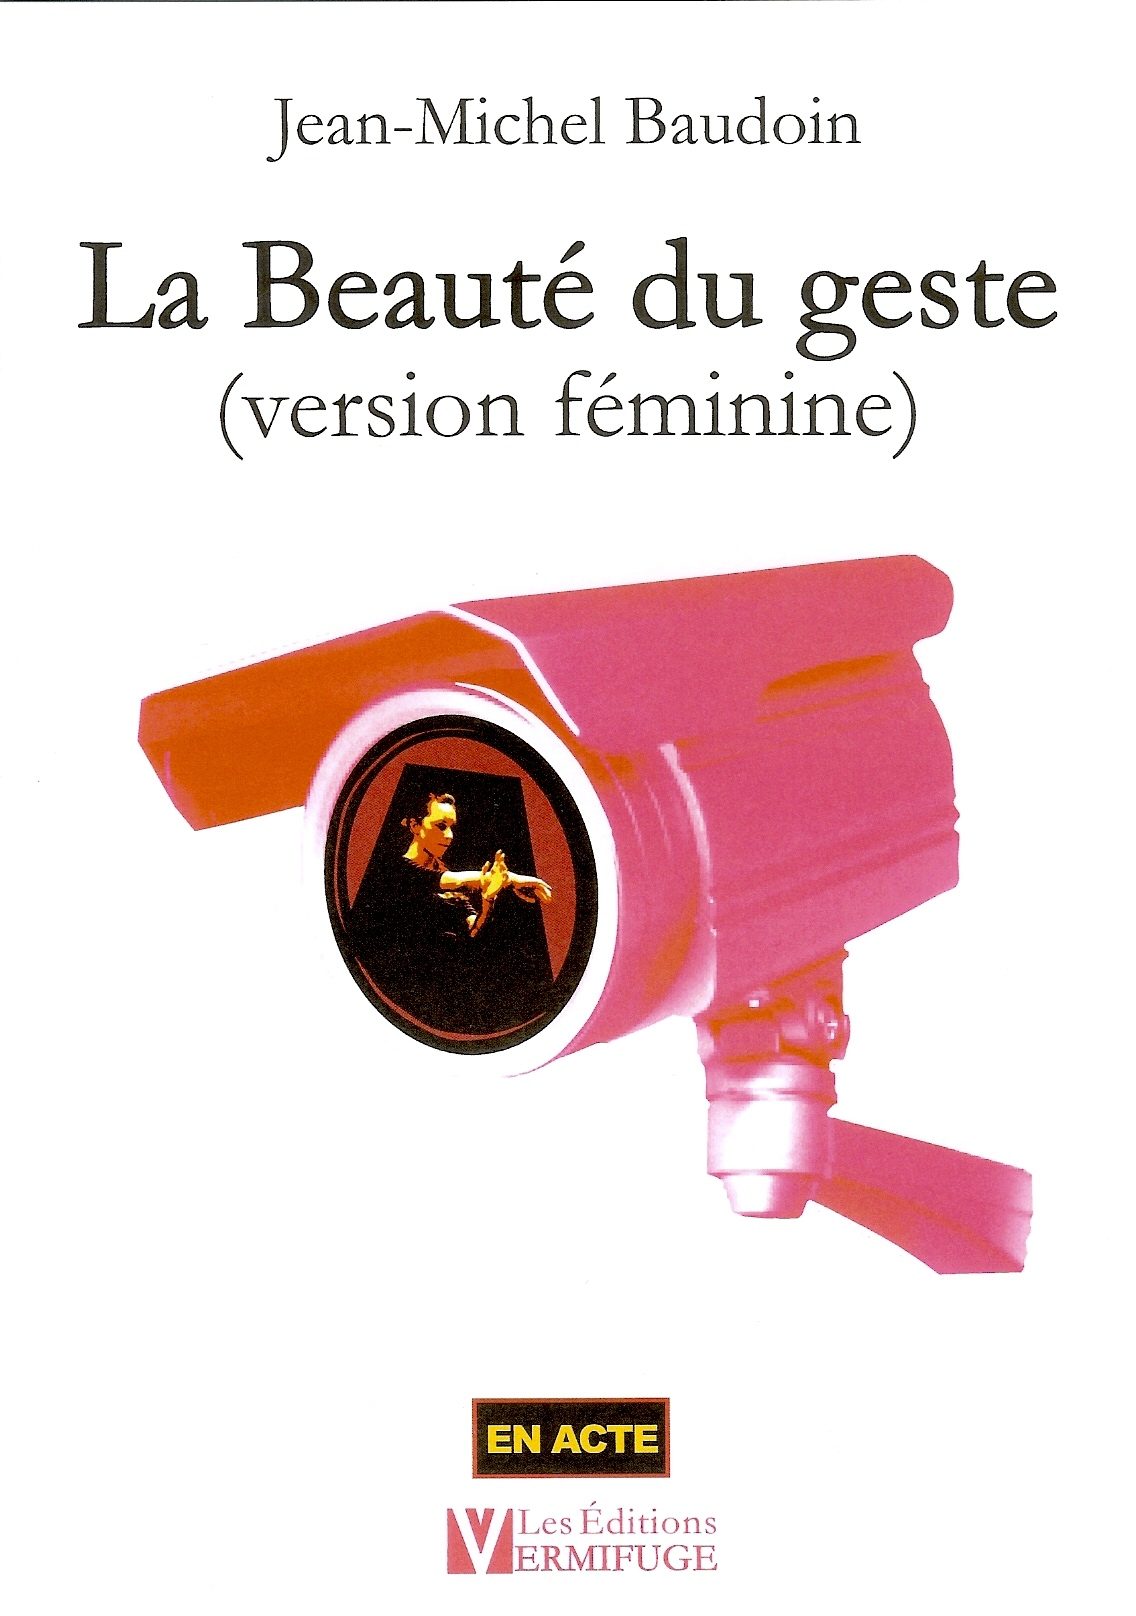 LA BEAUTE DU GESTE (VERSION FEMININE)